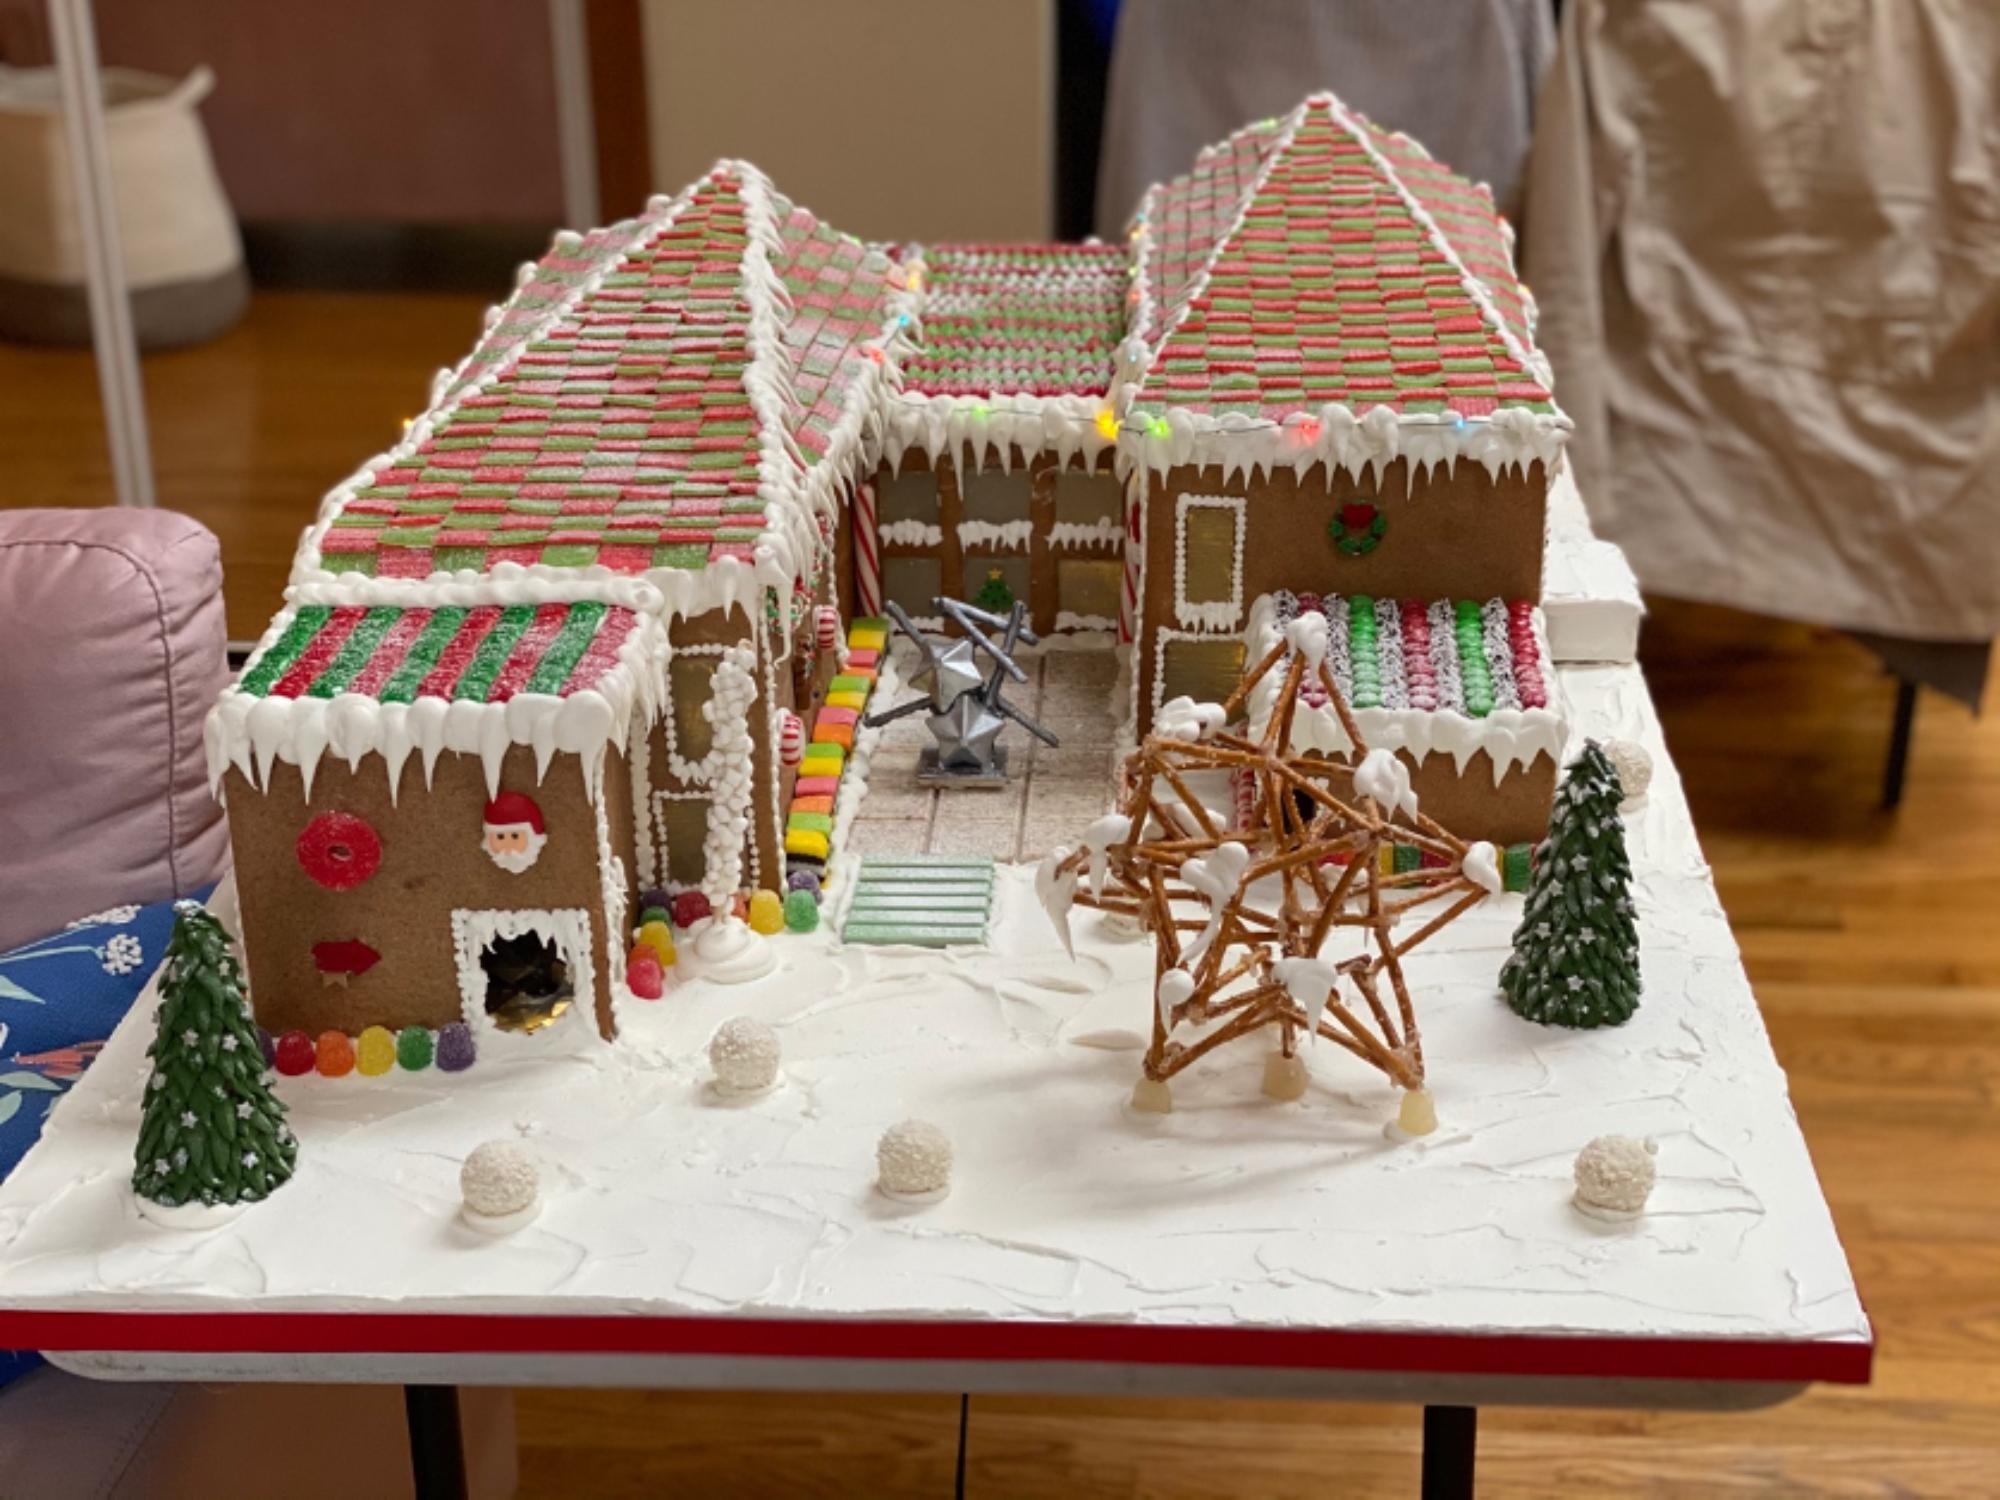 Gingerbread house replica of The Aldrich Contemporary Art Museum